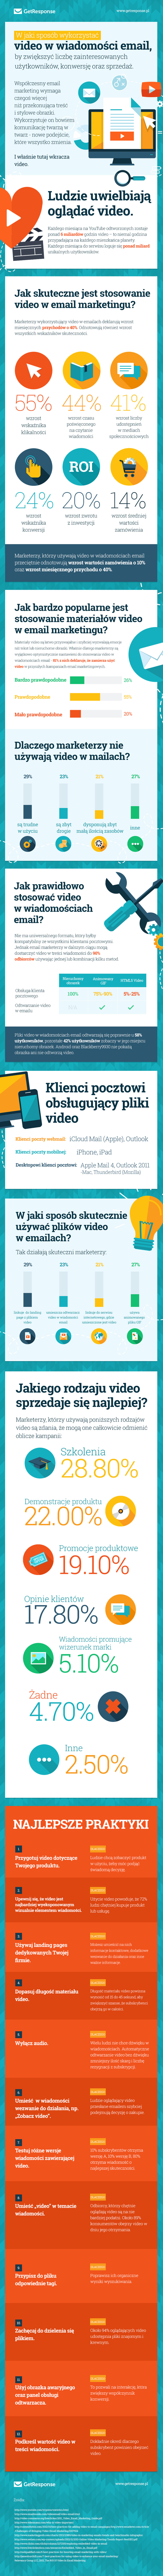 infographic_PL